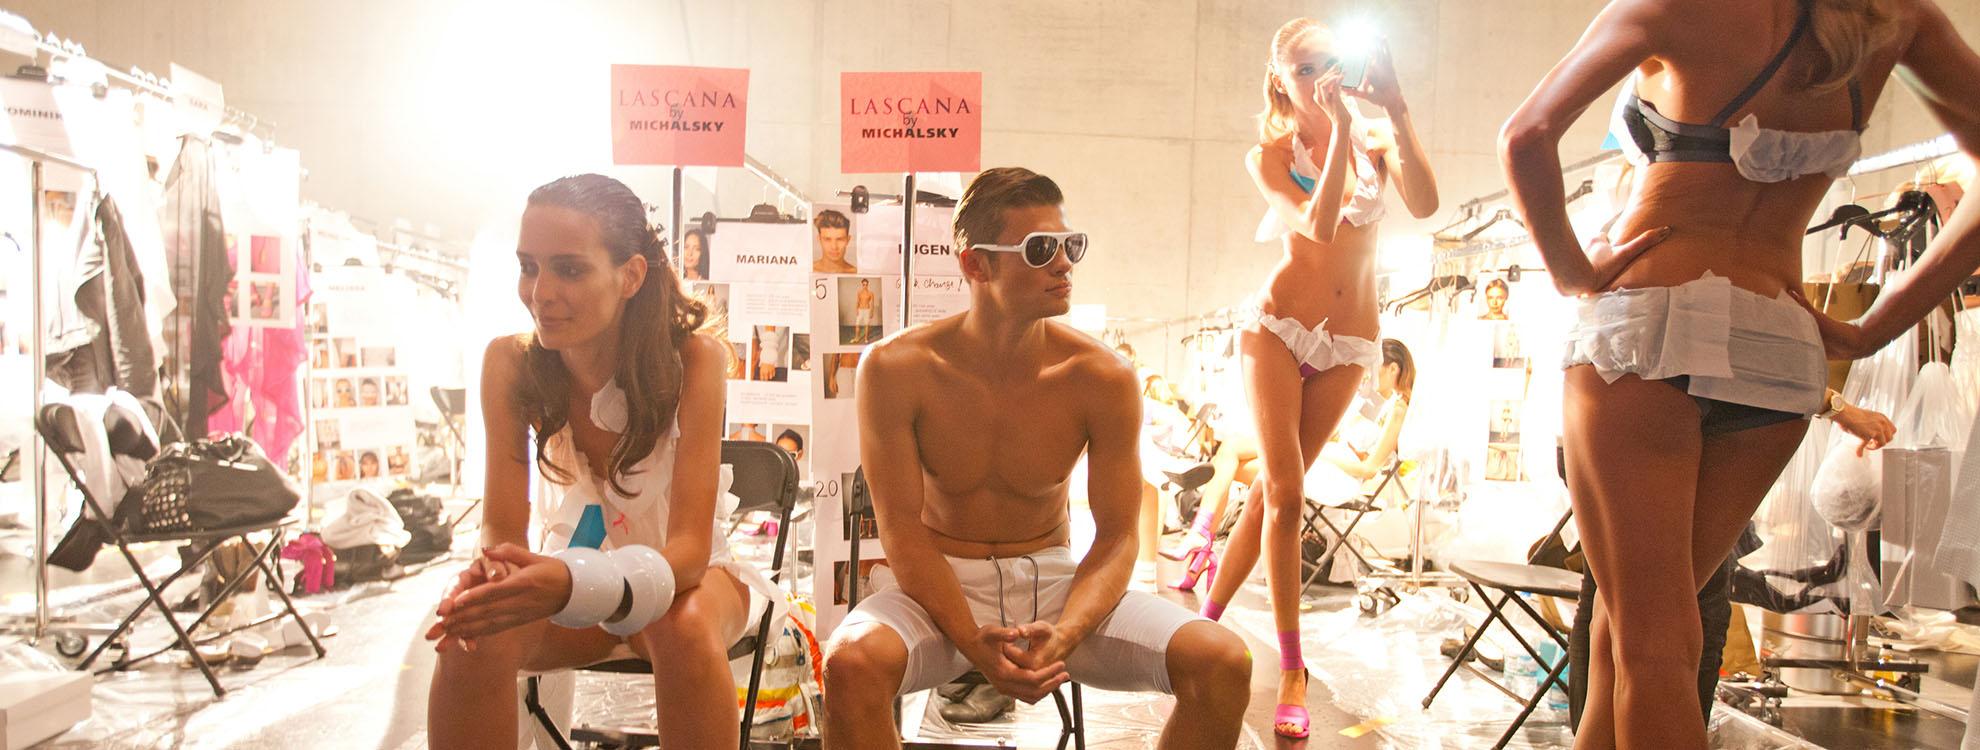 Fashion-Fotografie_Berlin_GRAND-VISIONS_Header